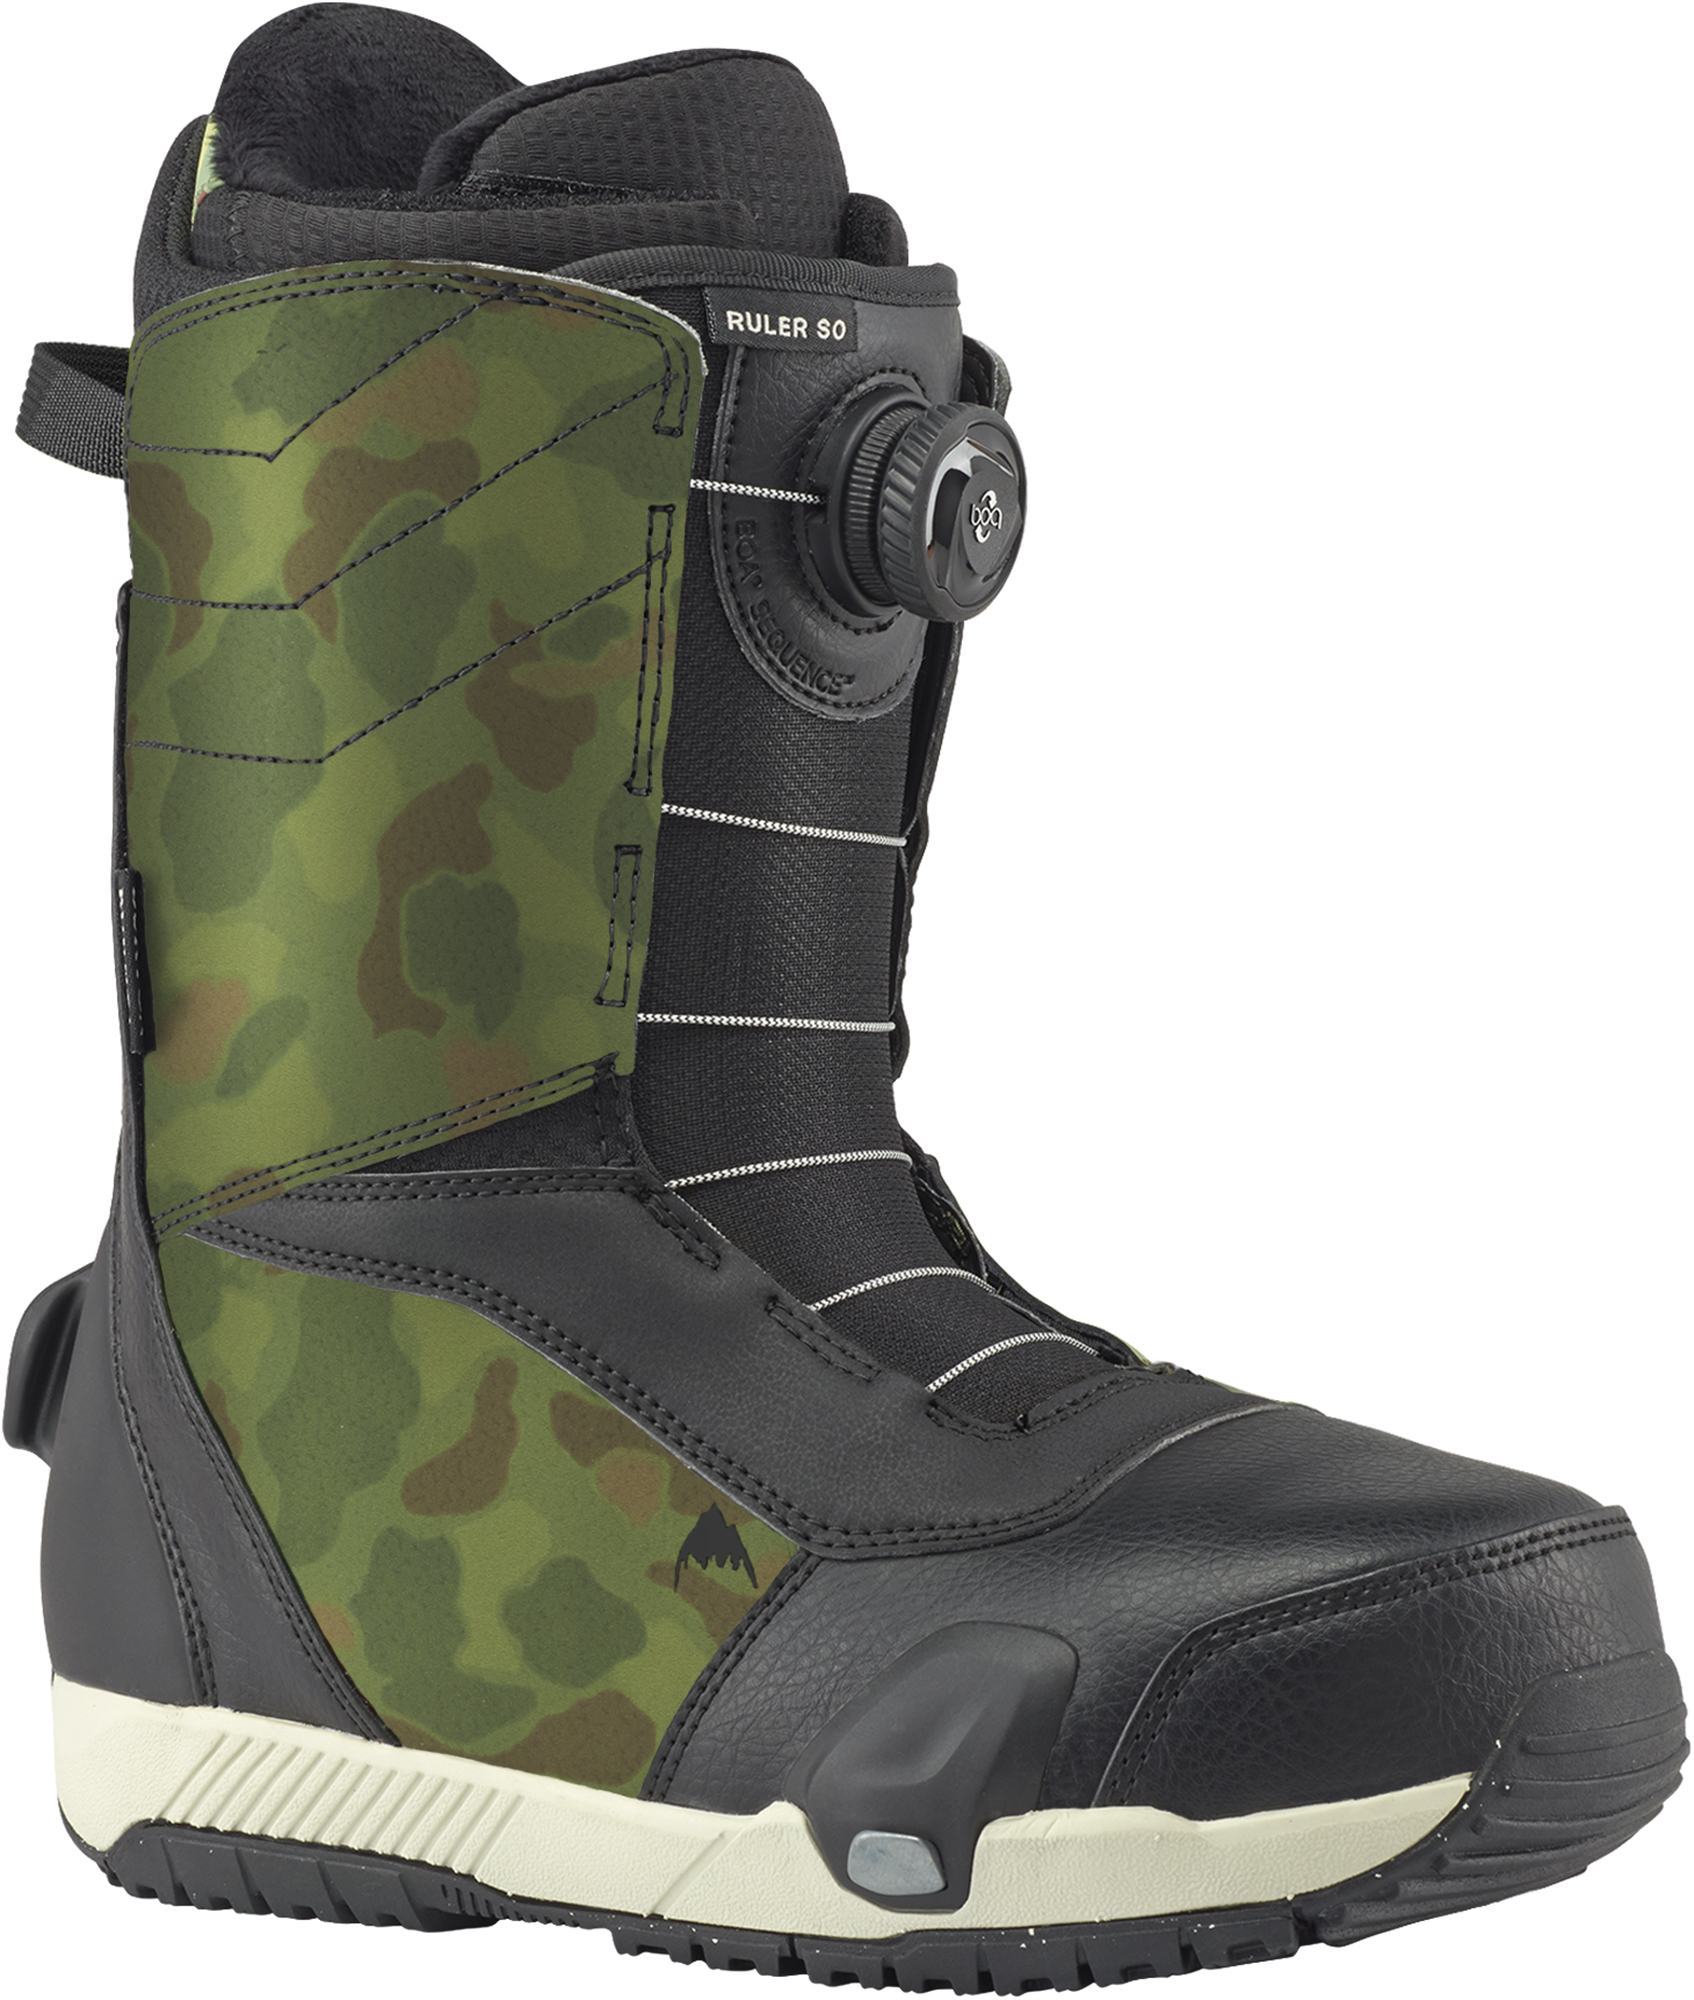 Burton Сноубордические ботинки Ruler Step On, размер 43